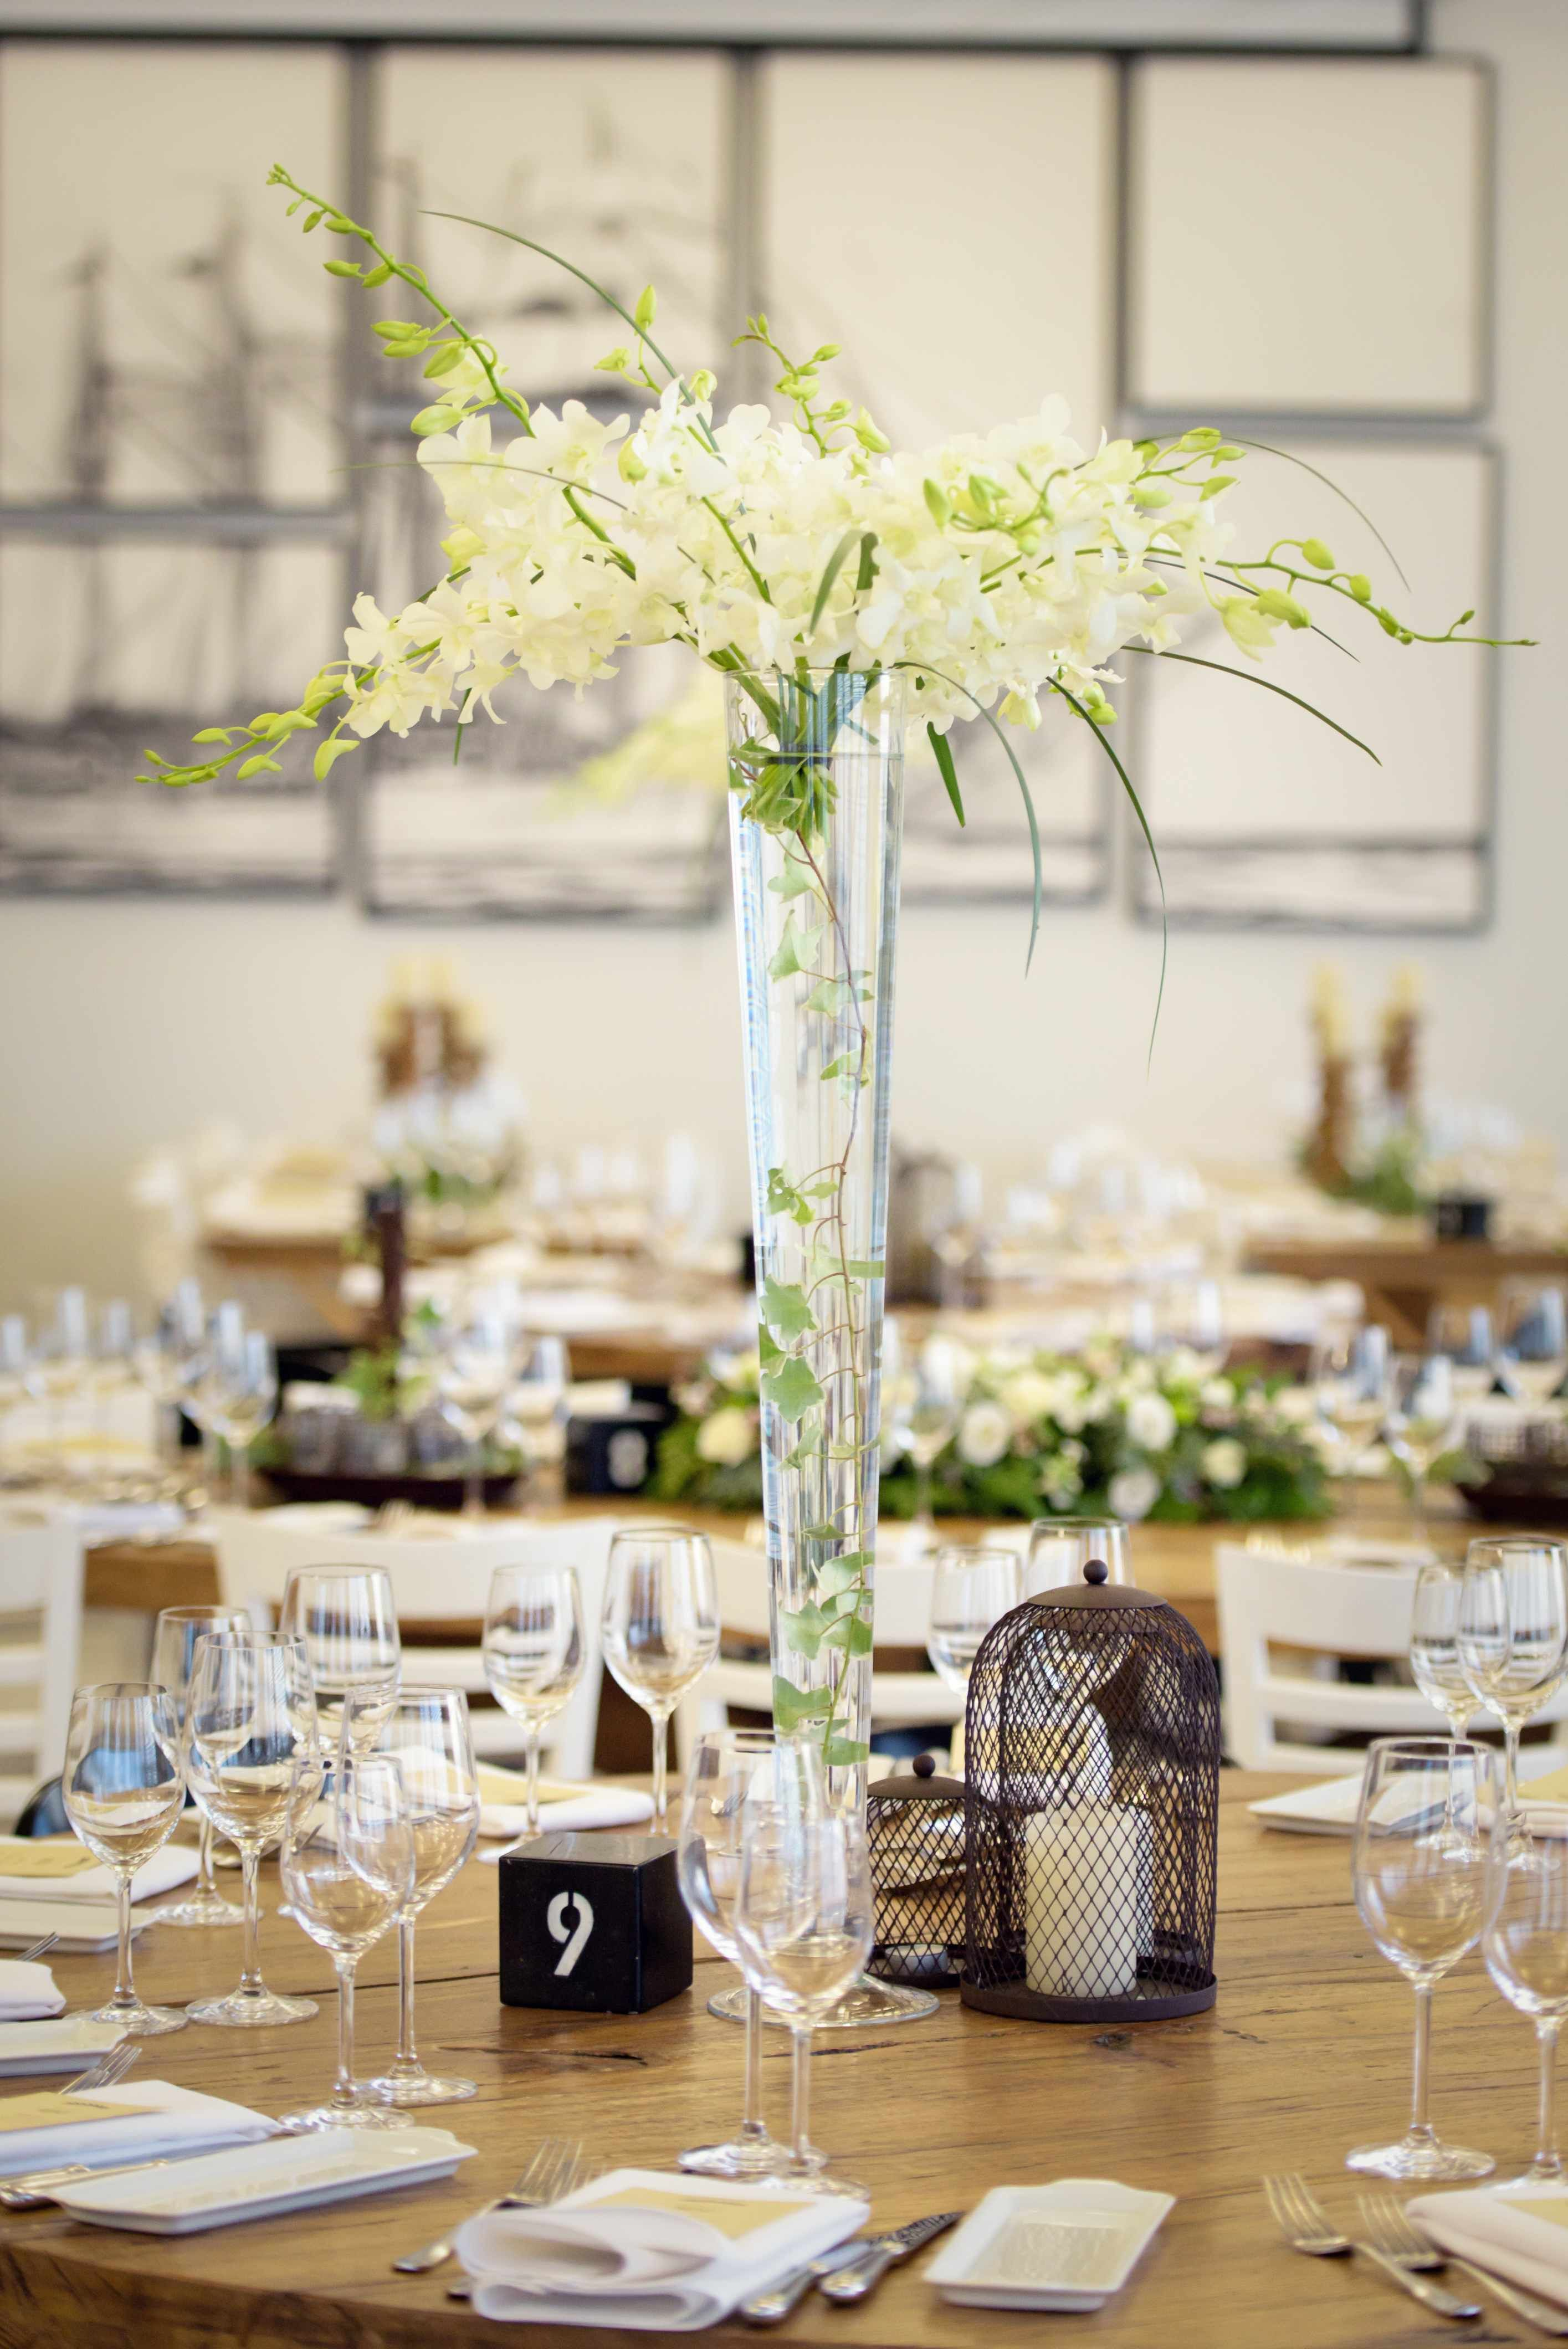 Yahav Green - Tailor Made Design Venue: housea Photo: Yulia Tokarev ...